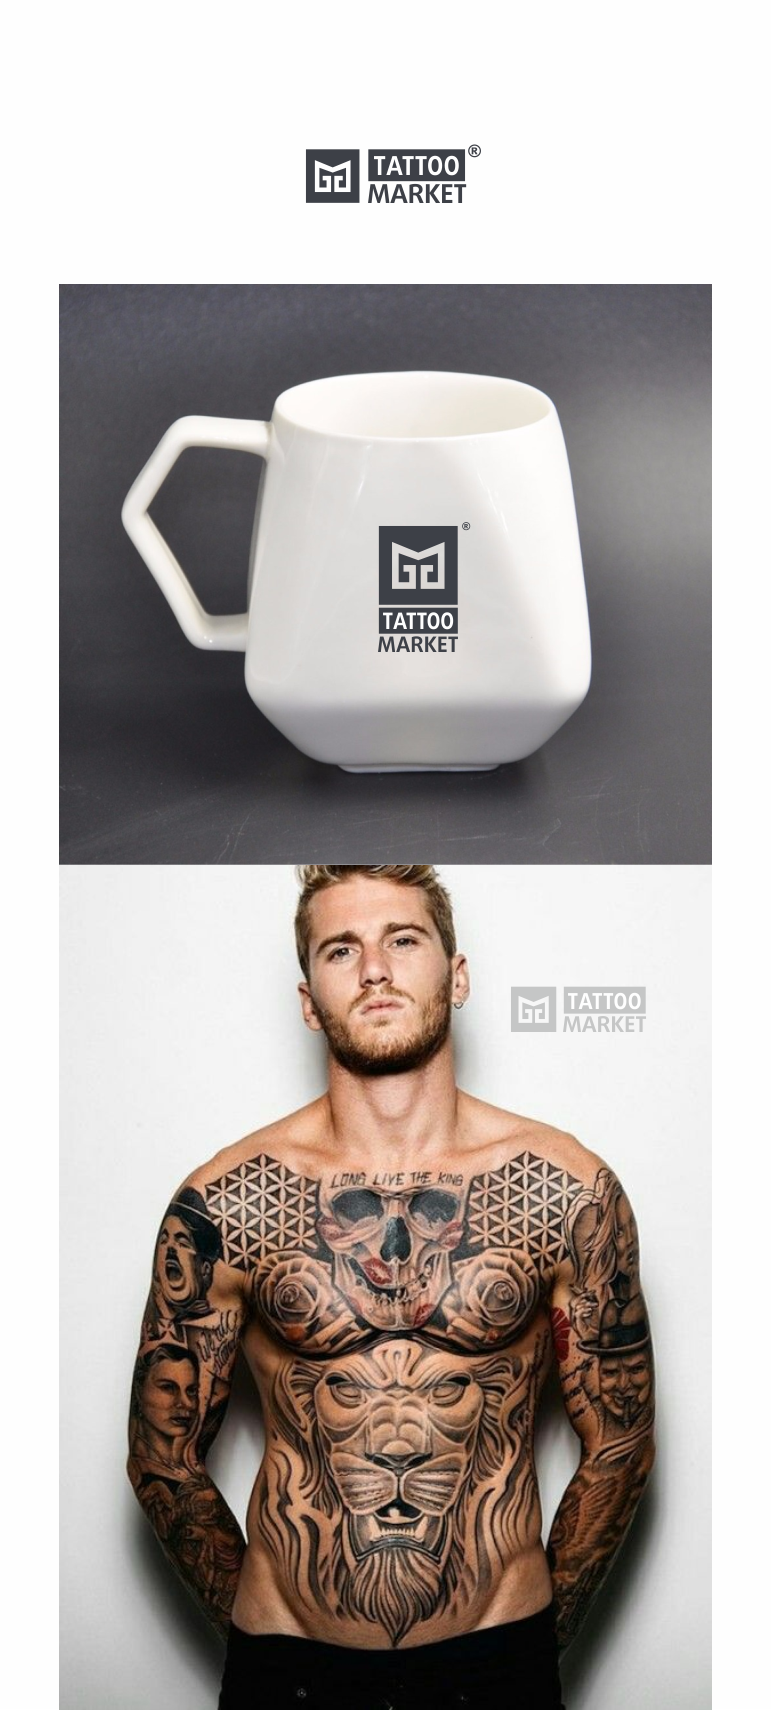 Редизайн логотипа магазина тату оборудования TattooMarket.ru фото f_0795c38d22dca879.png